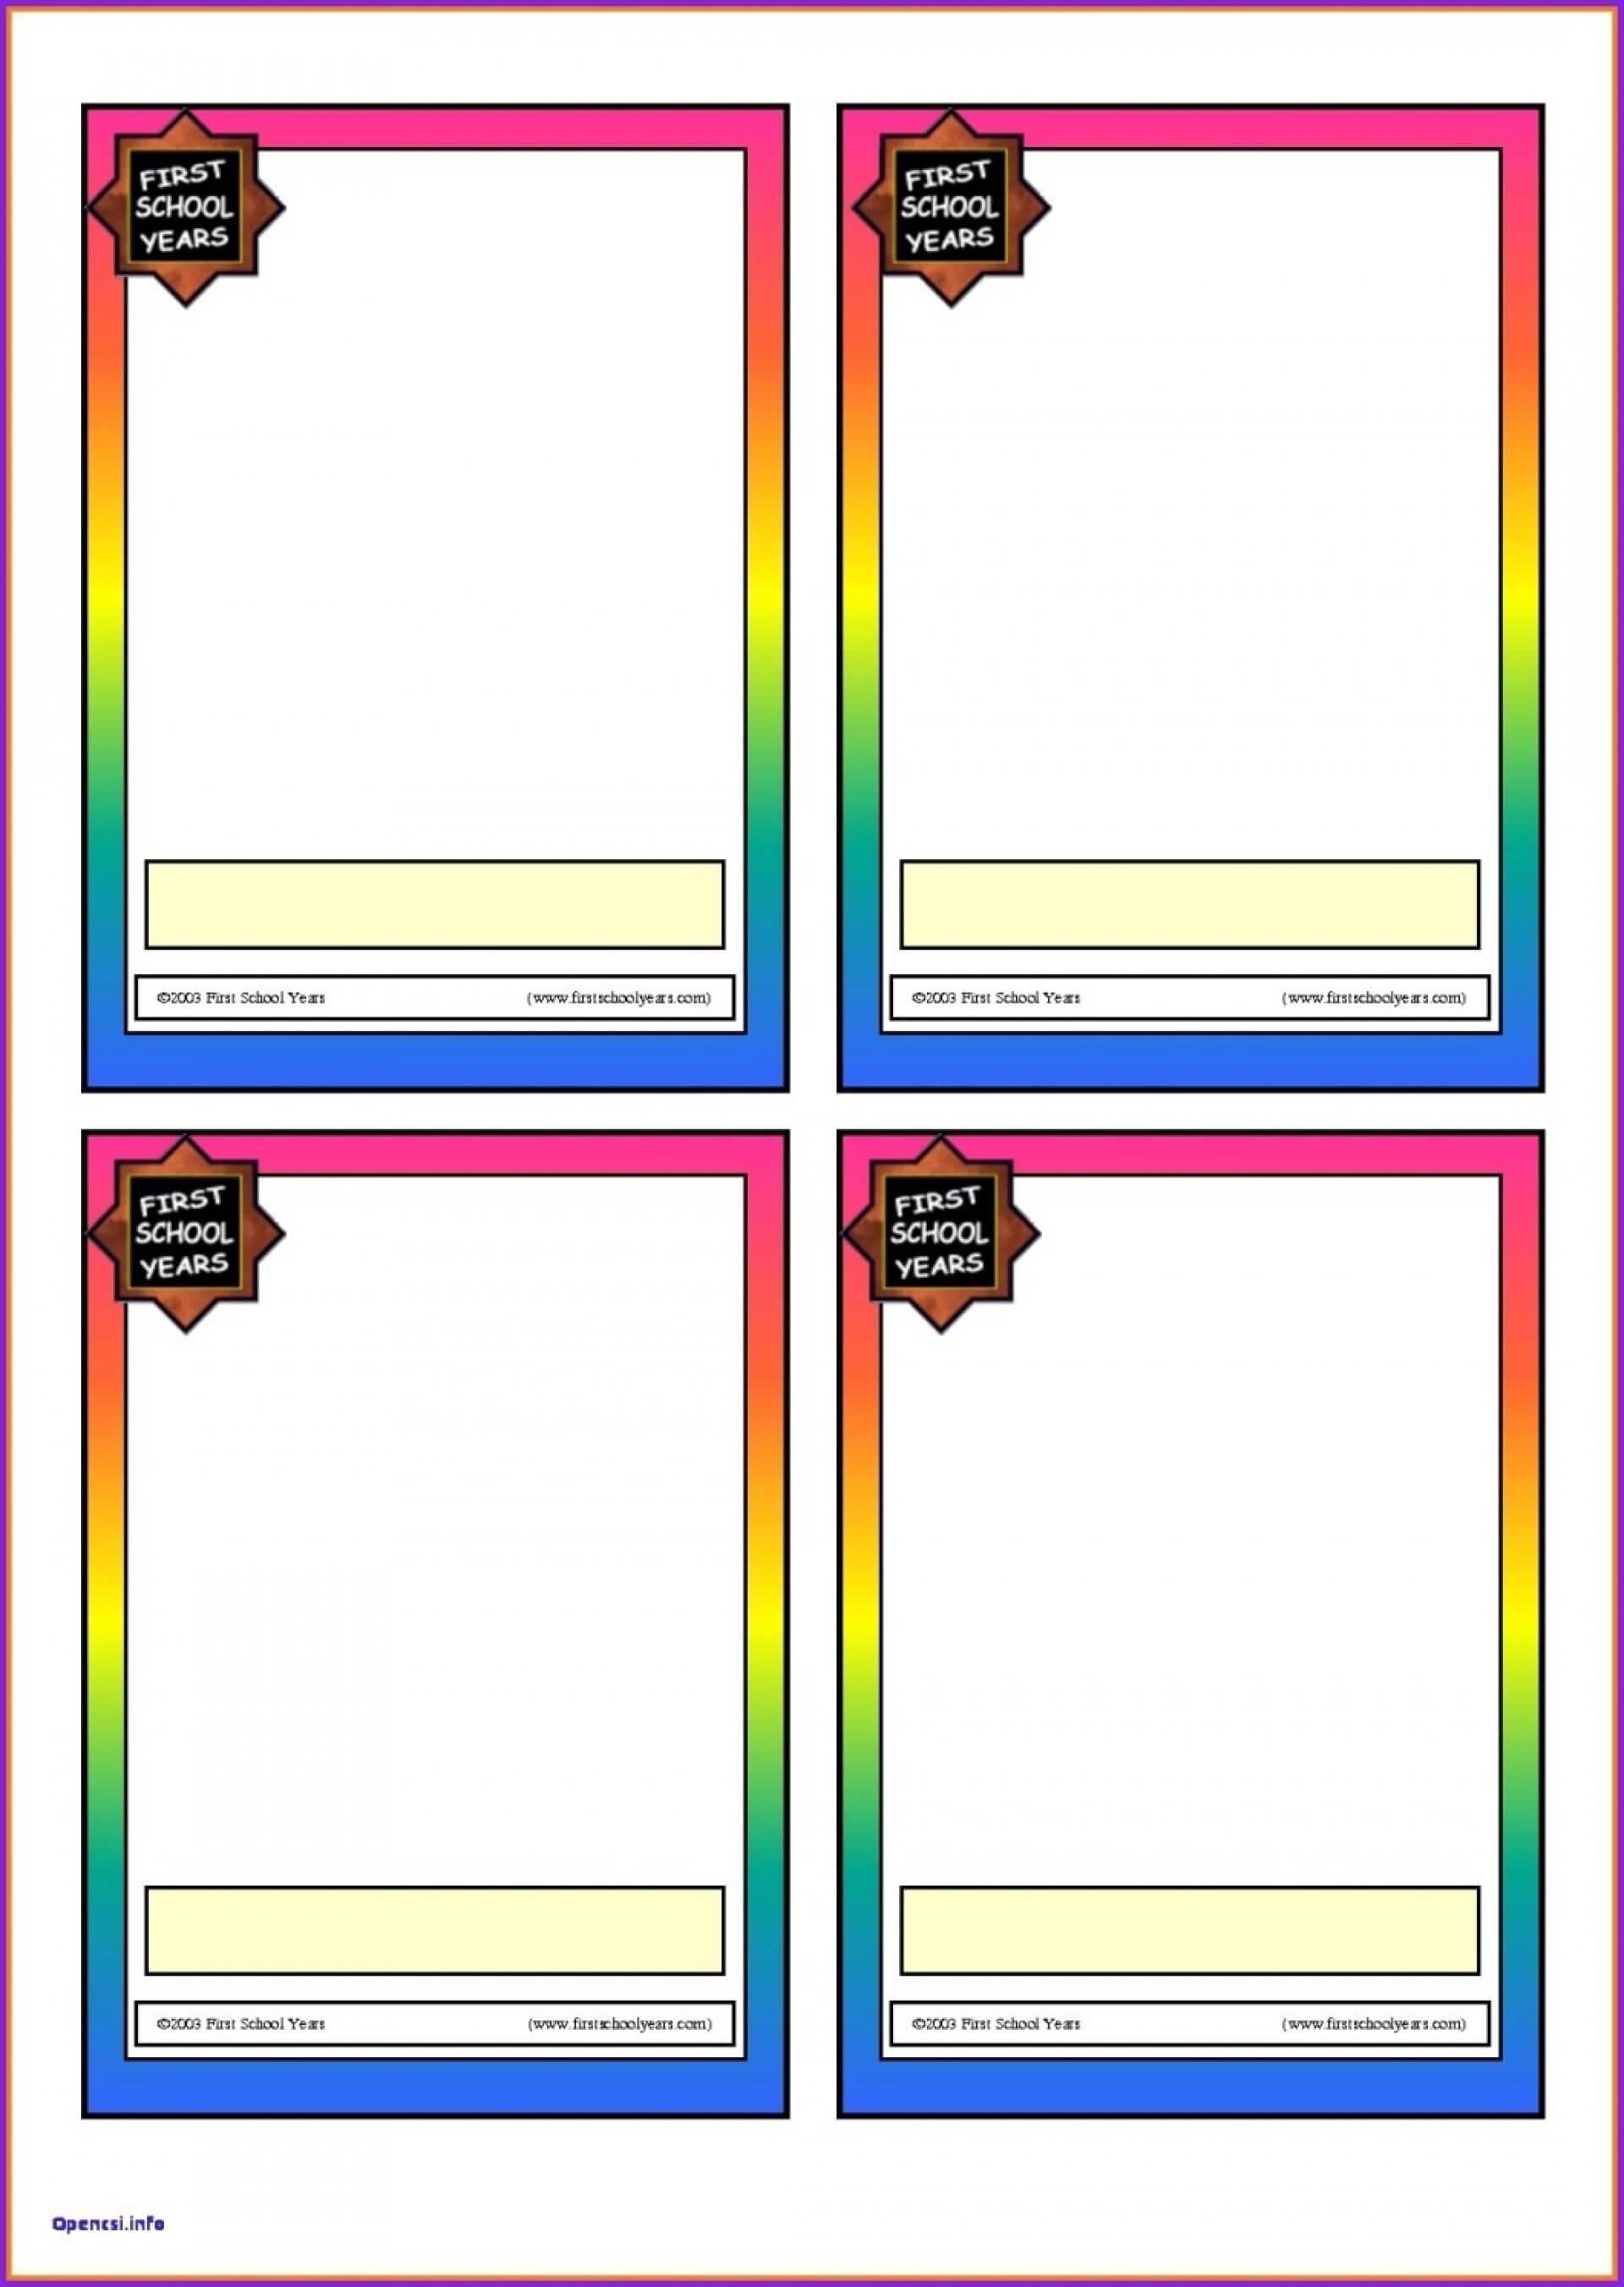 005 Printable Flash Card Template Top Ideas Free Blank within Free Printable Flash Cards Template